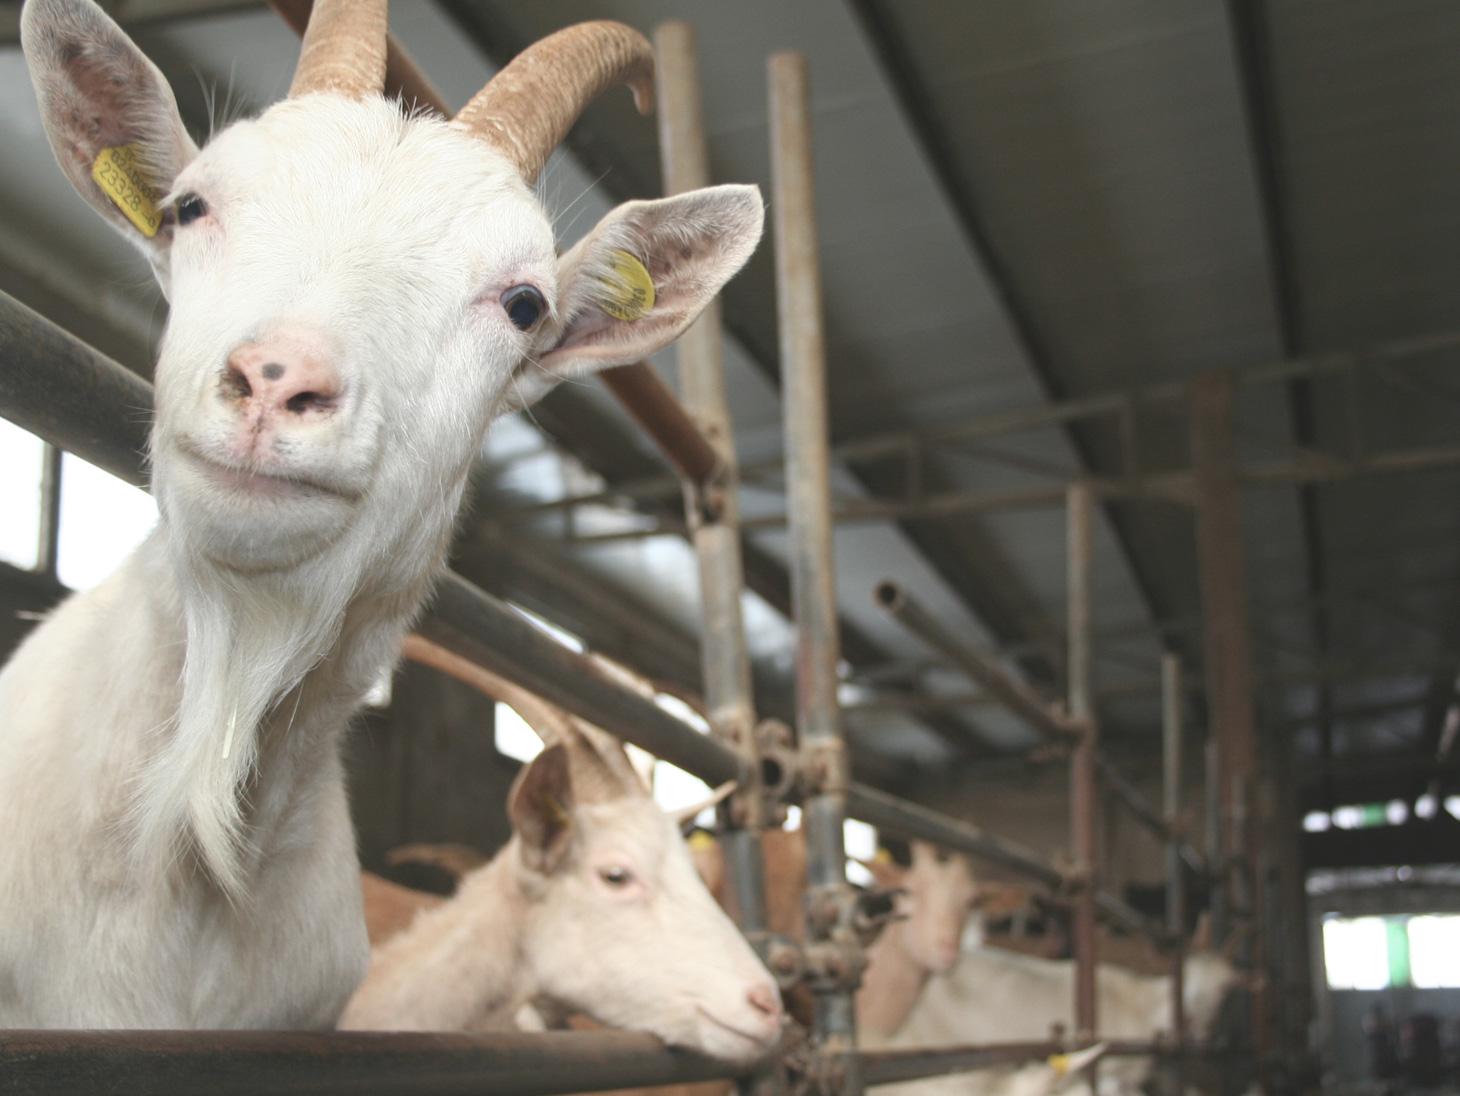 The goats of La Capreria